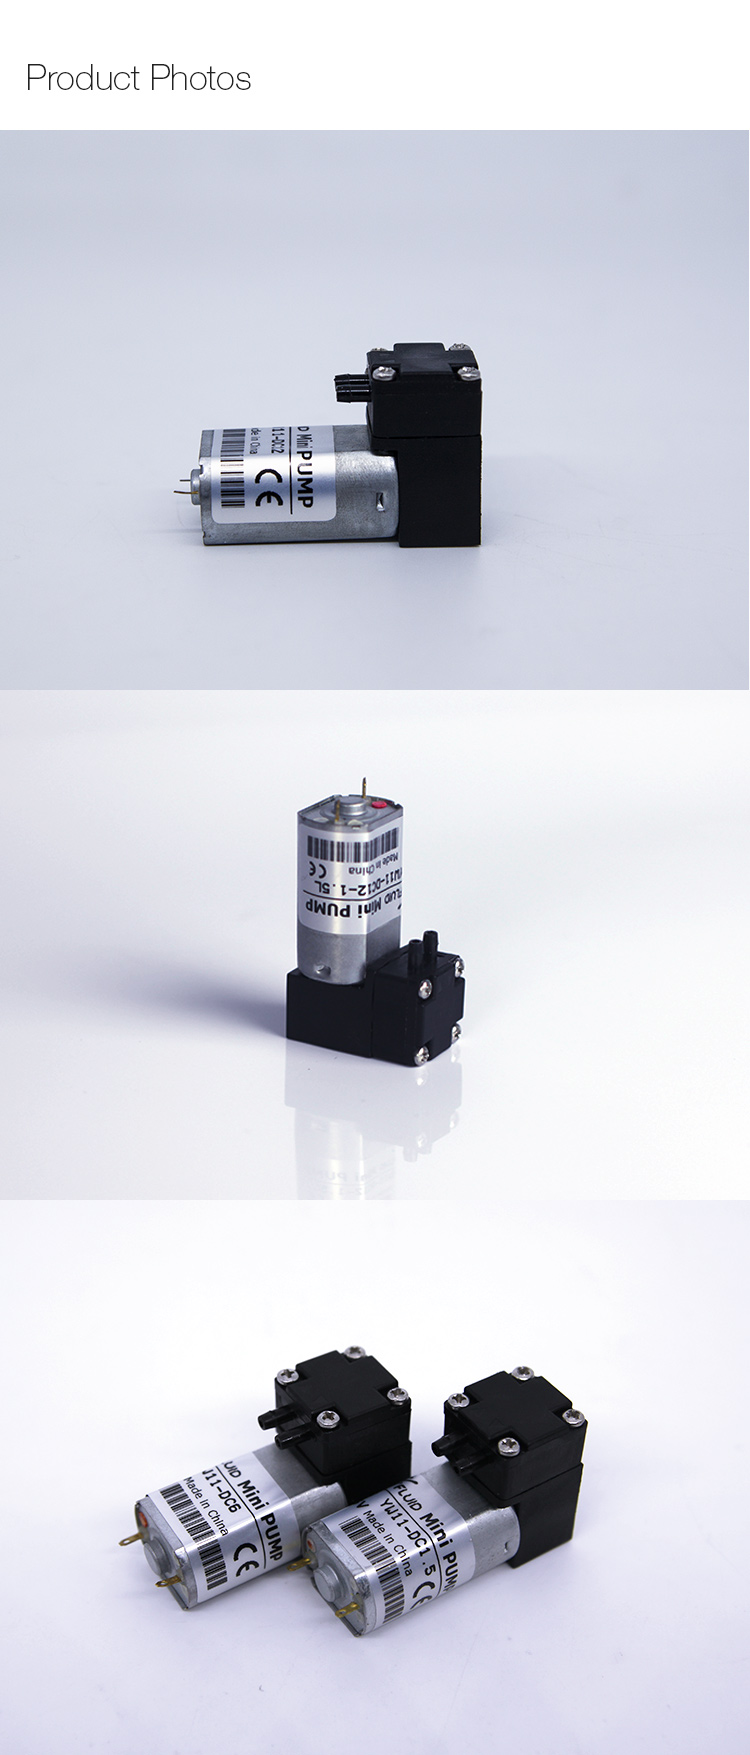 YW11 DC 1.5L Energía eléctrica 0.3Mpa DC mini pulverizador 12v bomba de diafragma micro operado por aire